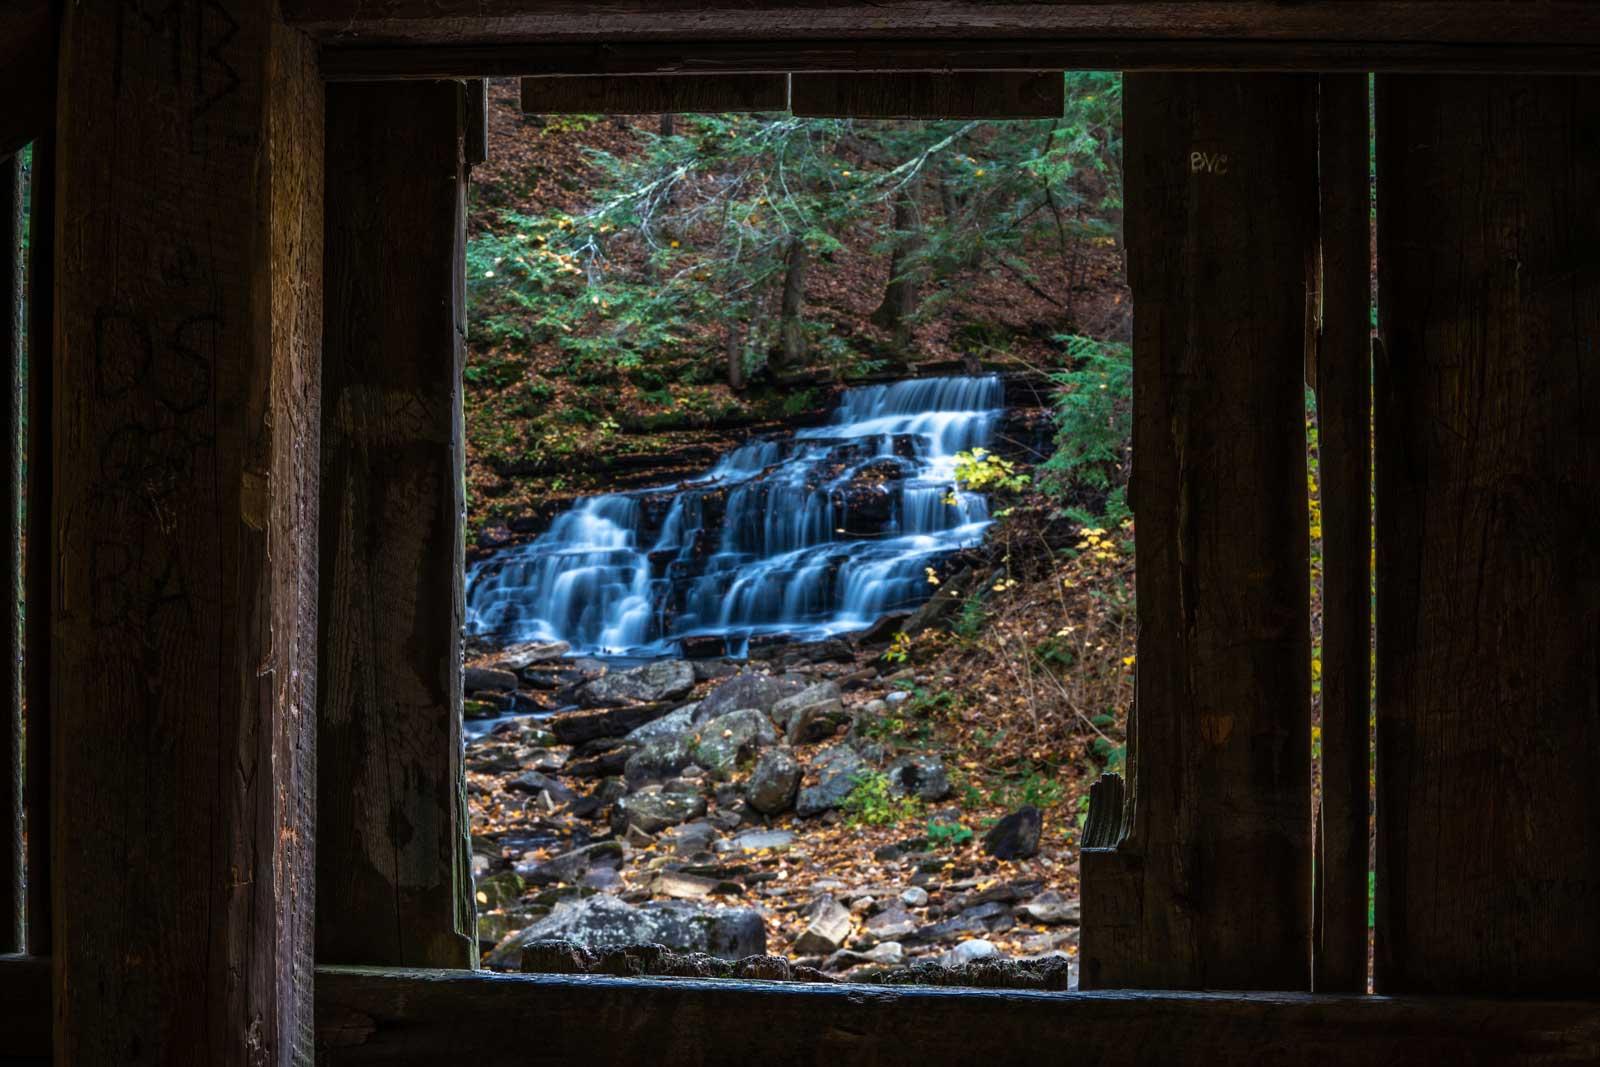 Beecher-Creek-Falls-in-New-York-near-Edinburg-in-the-Adirondacks-from-the-Copeland-Covered-Bridge